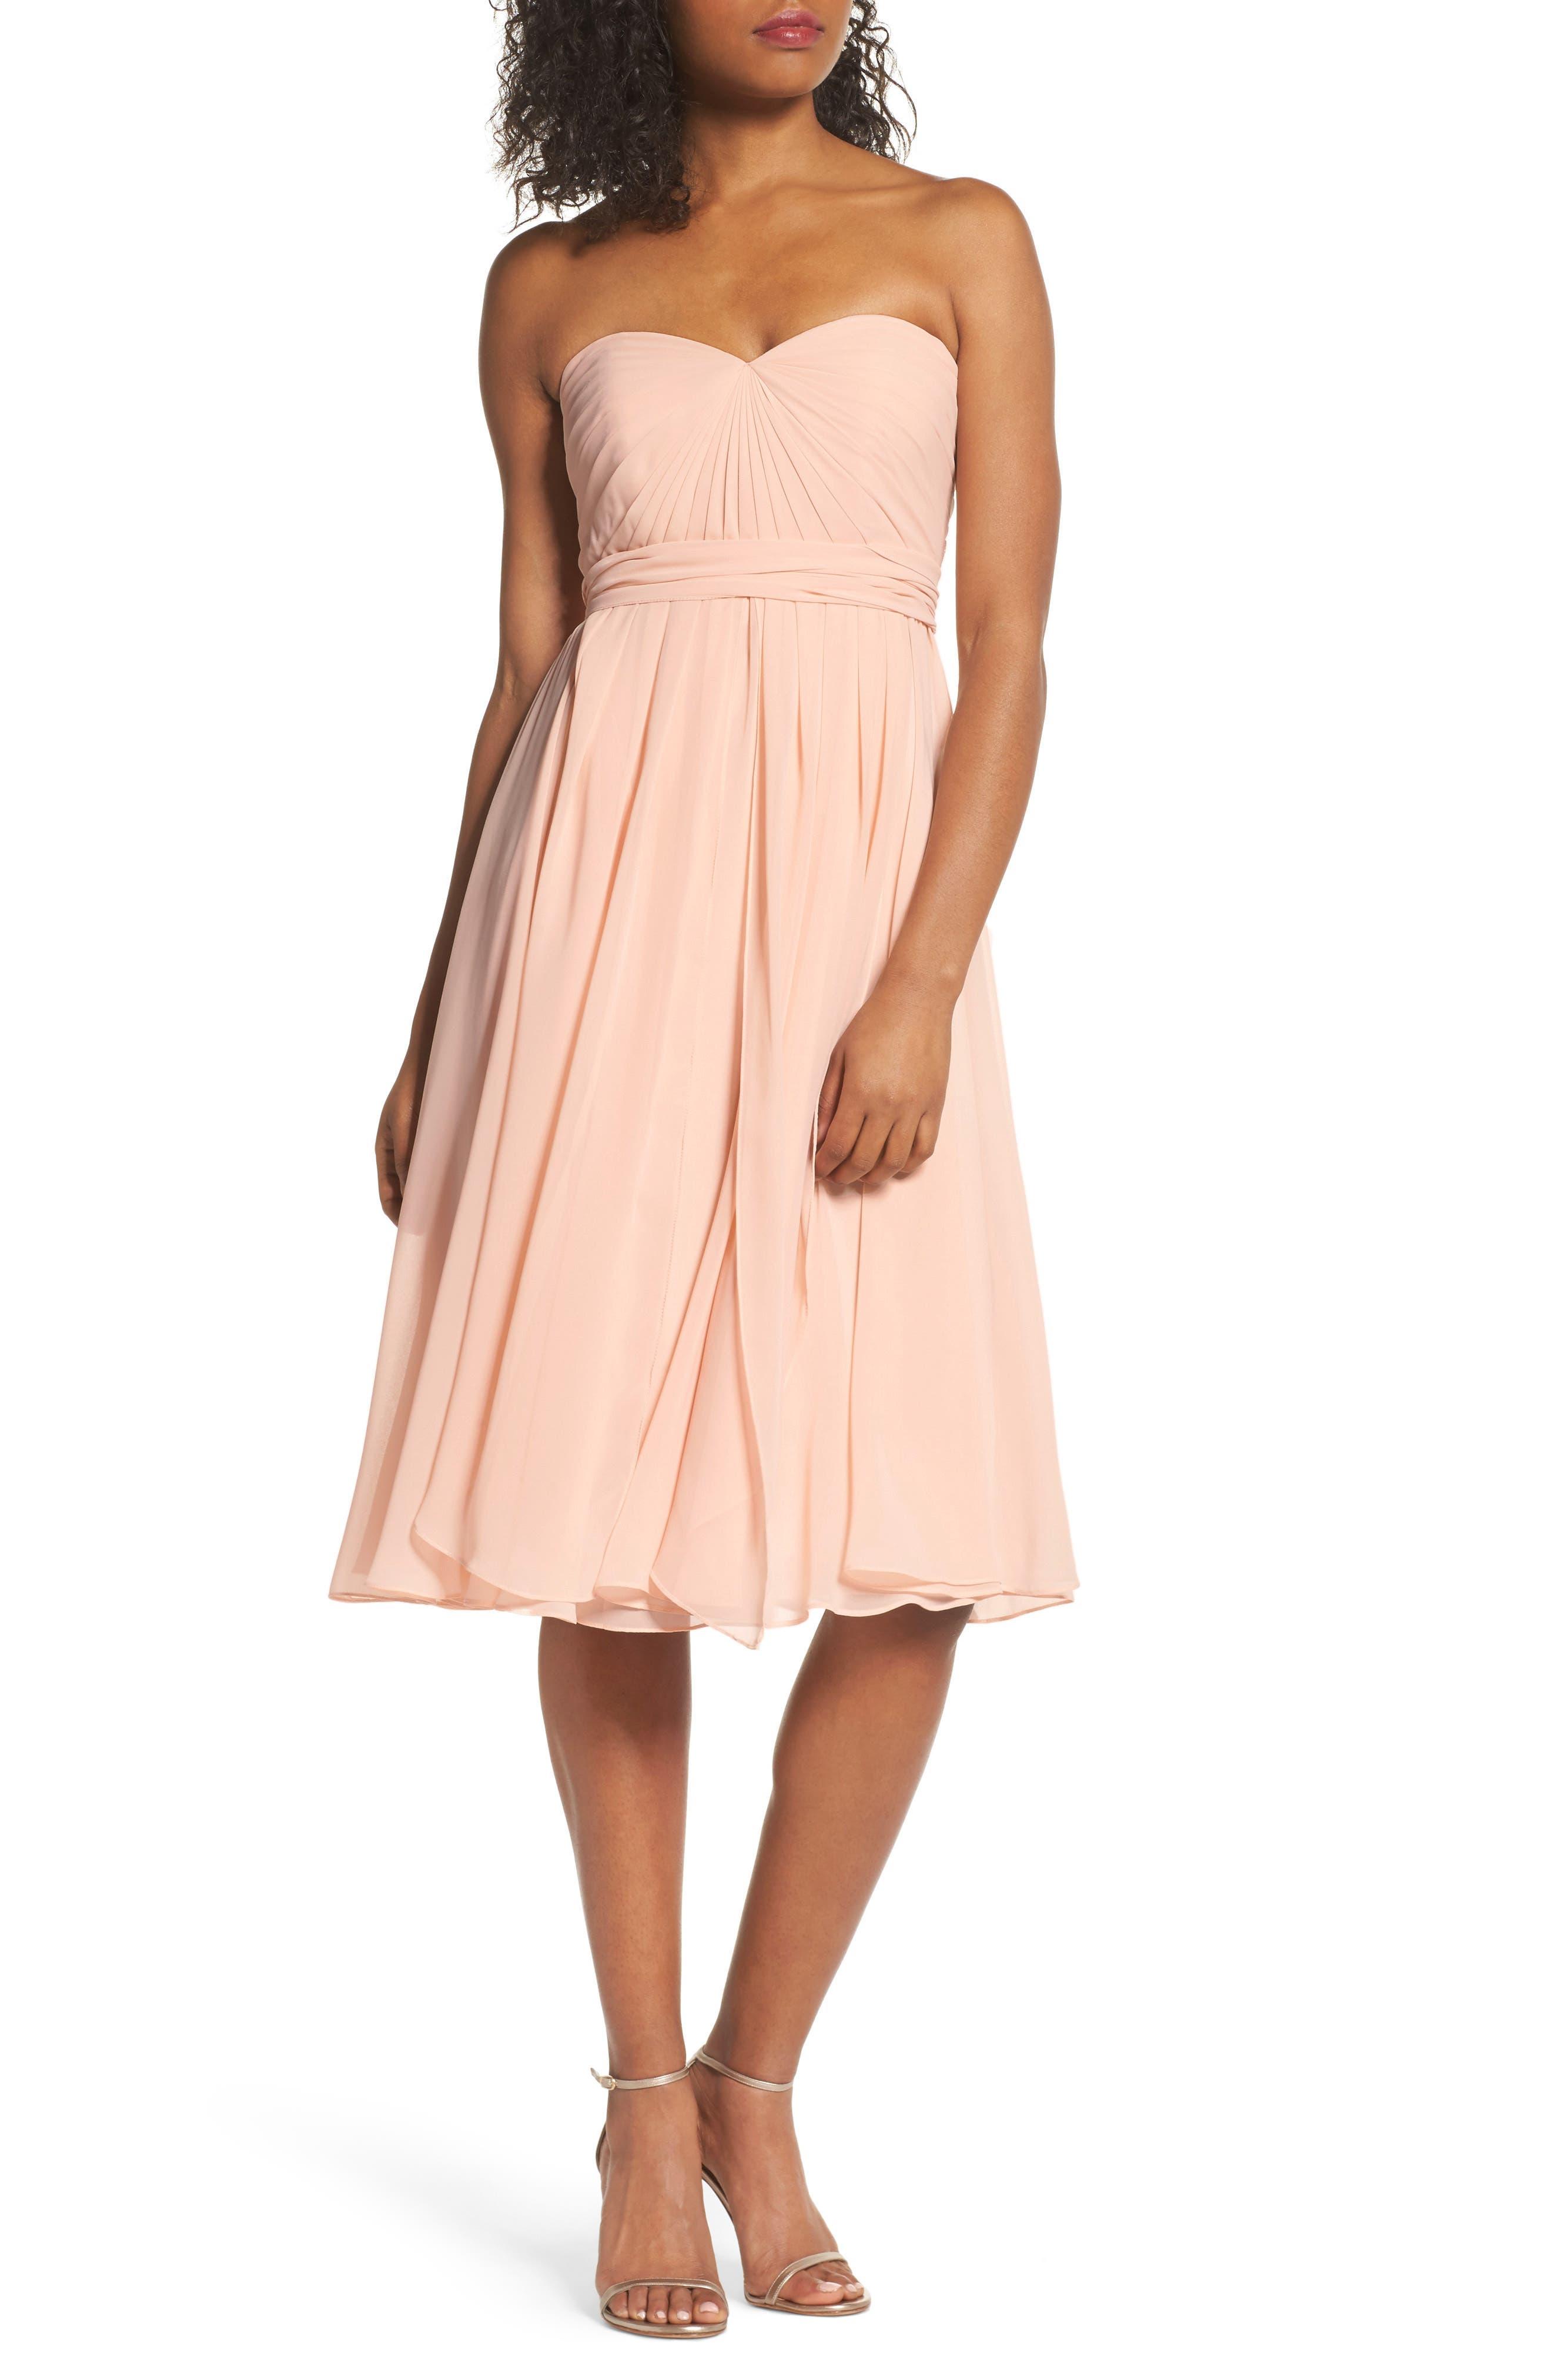 Jenny Yoo Emmie Convertible Chiffon Tea-Length Dress